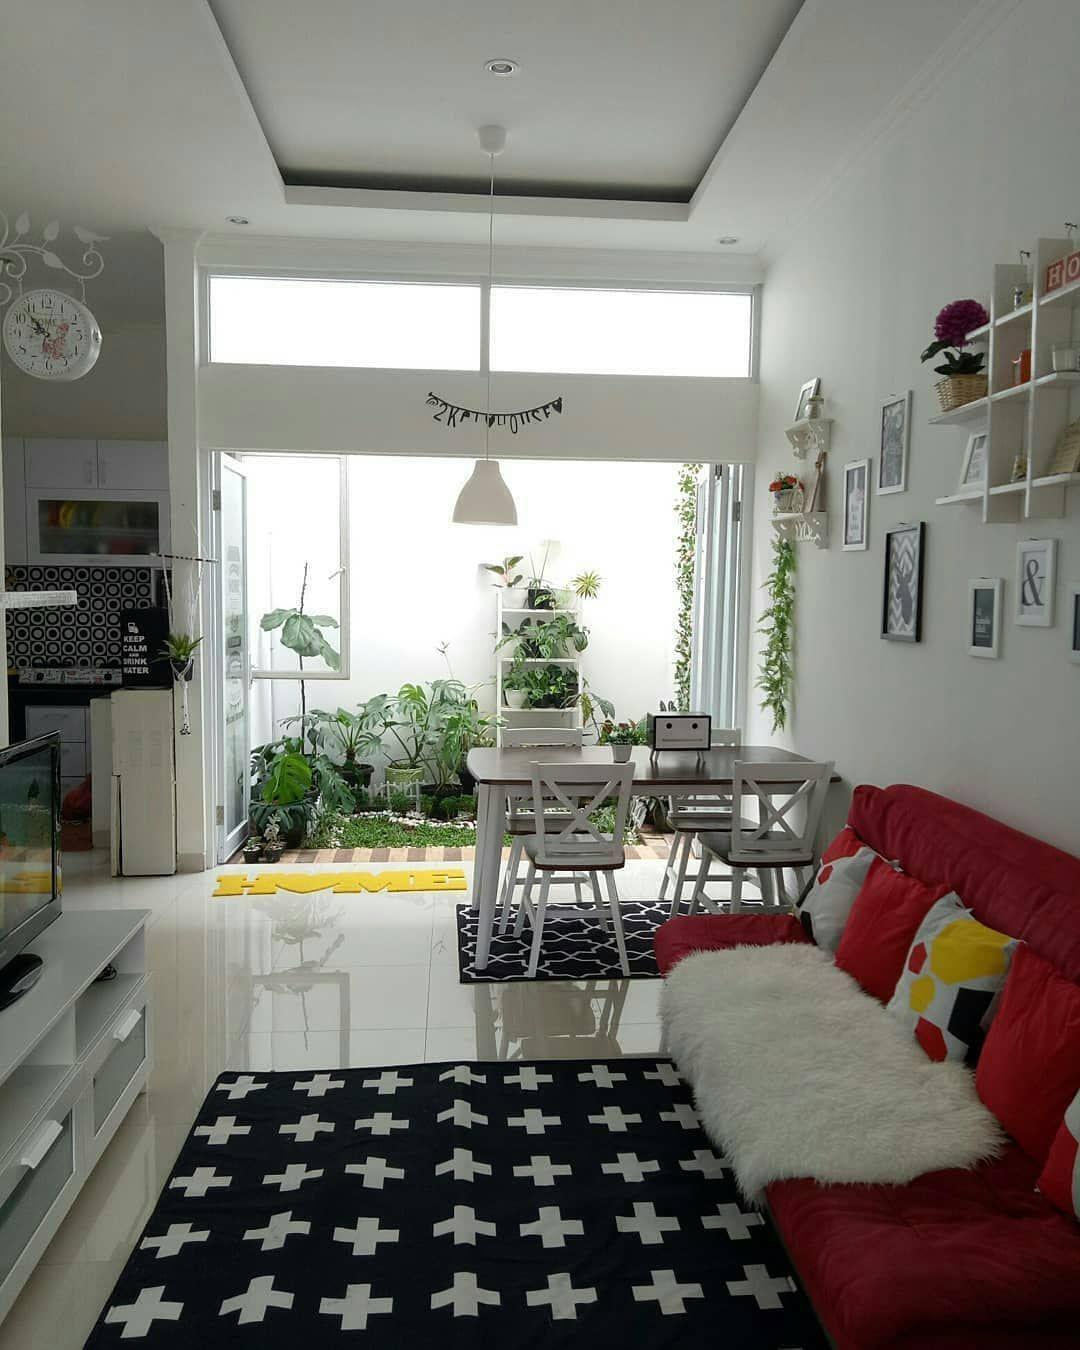 Rumah Impian Minimalis On Instagram Ruangan Makan Istimewa